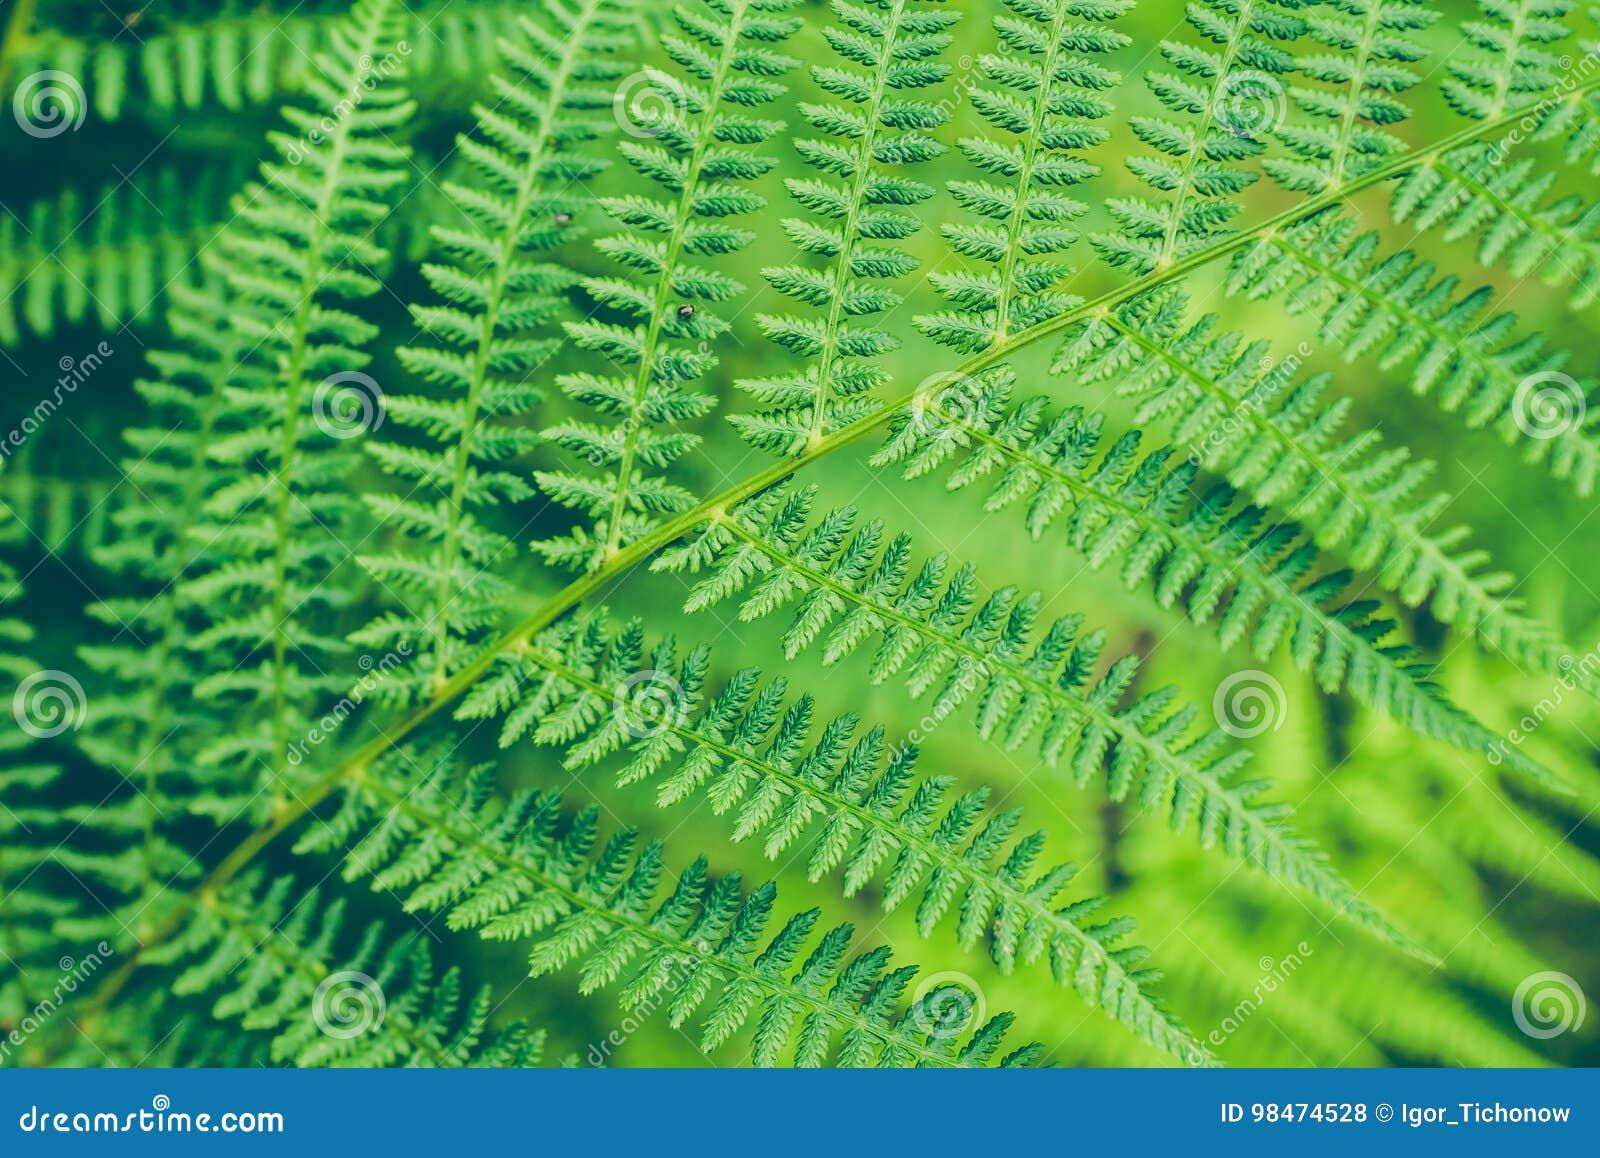 Beautyful蕨叶子 绿色叶子关闭 自然花卉蕨背景